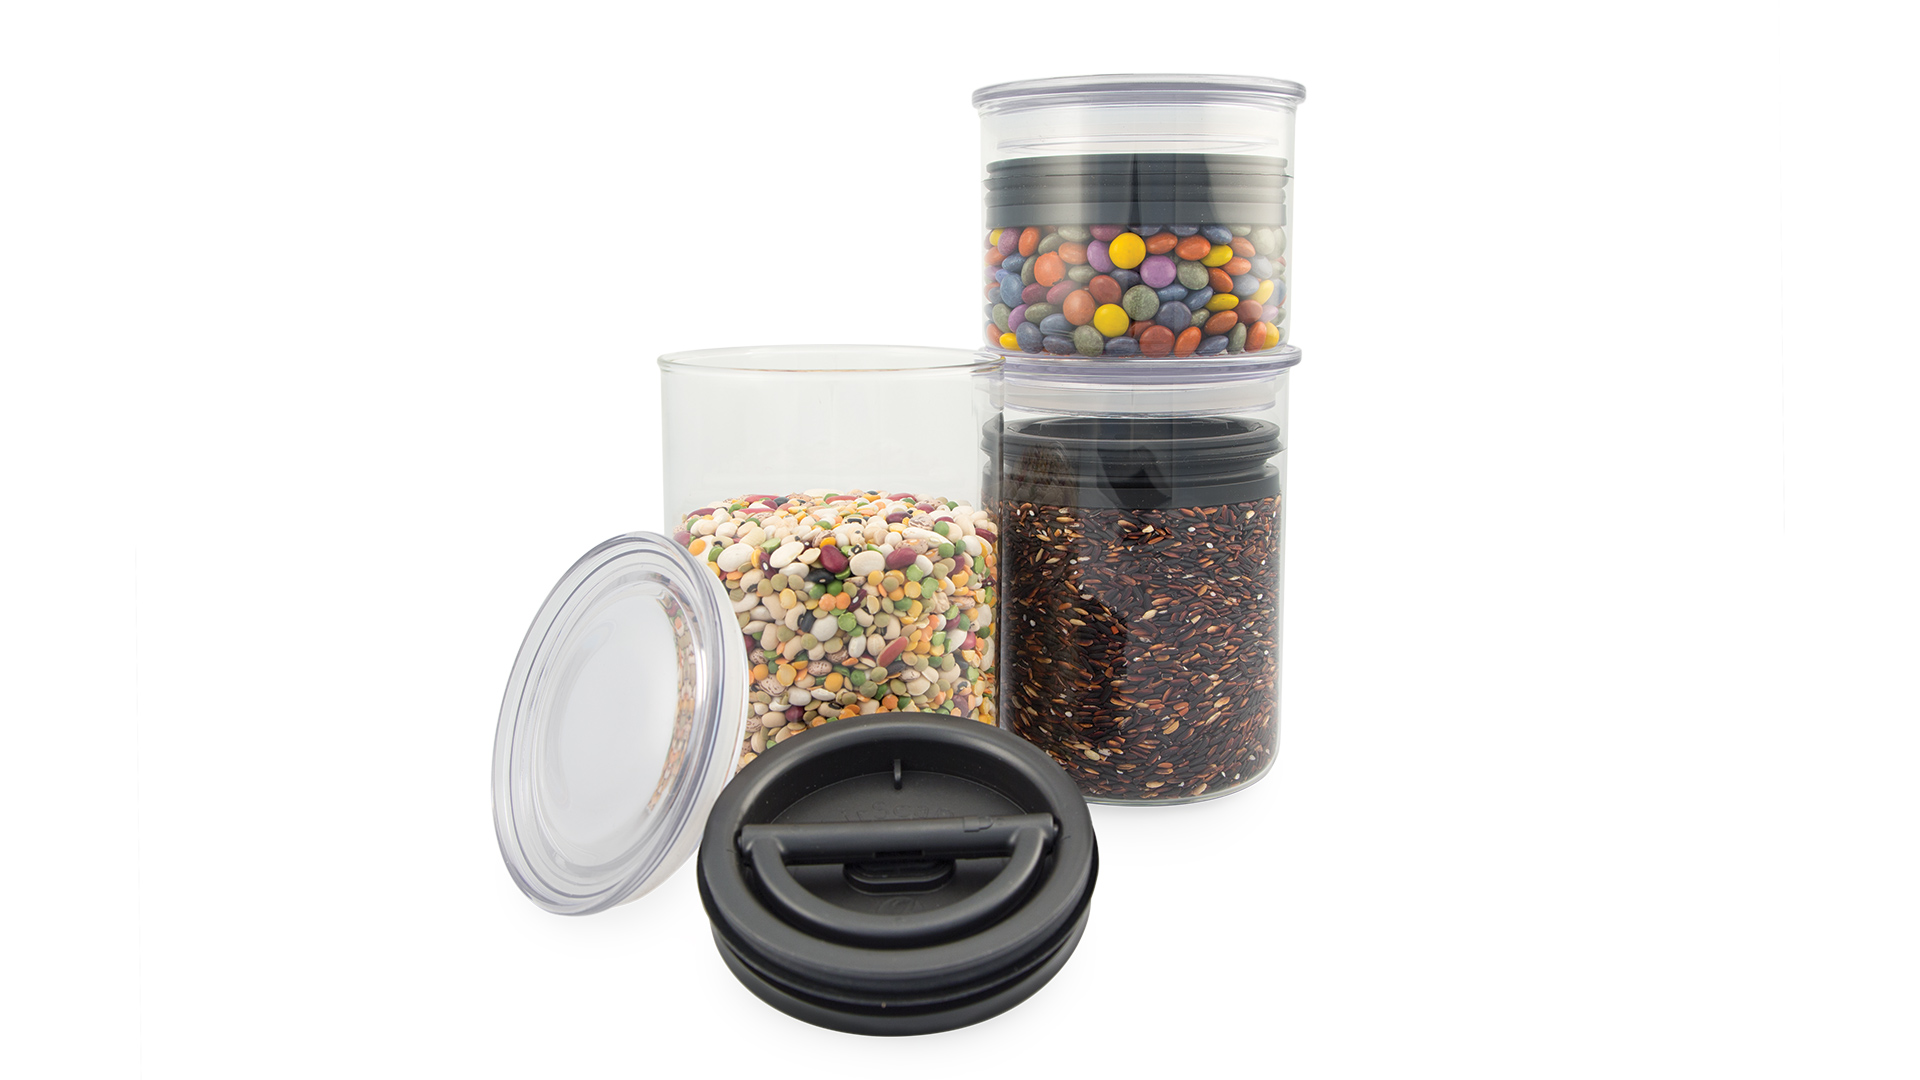 Dózy Airscape Glass na potraviny